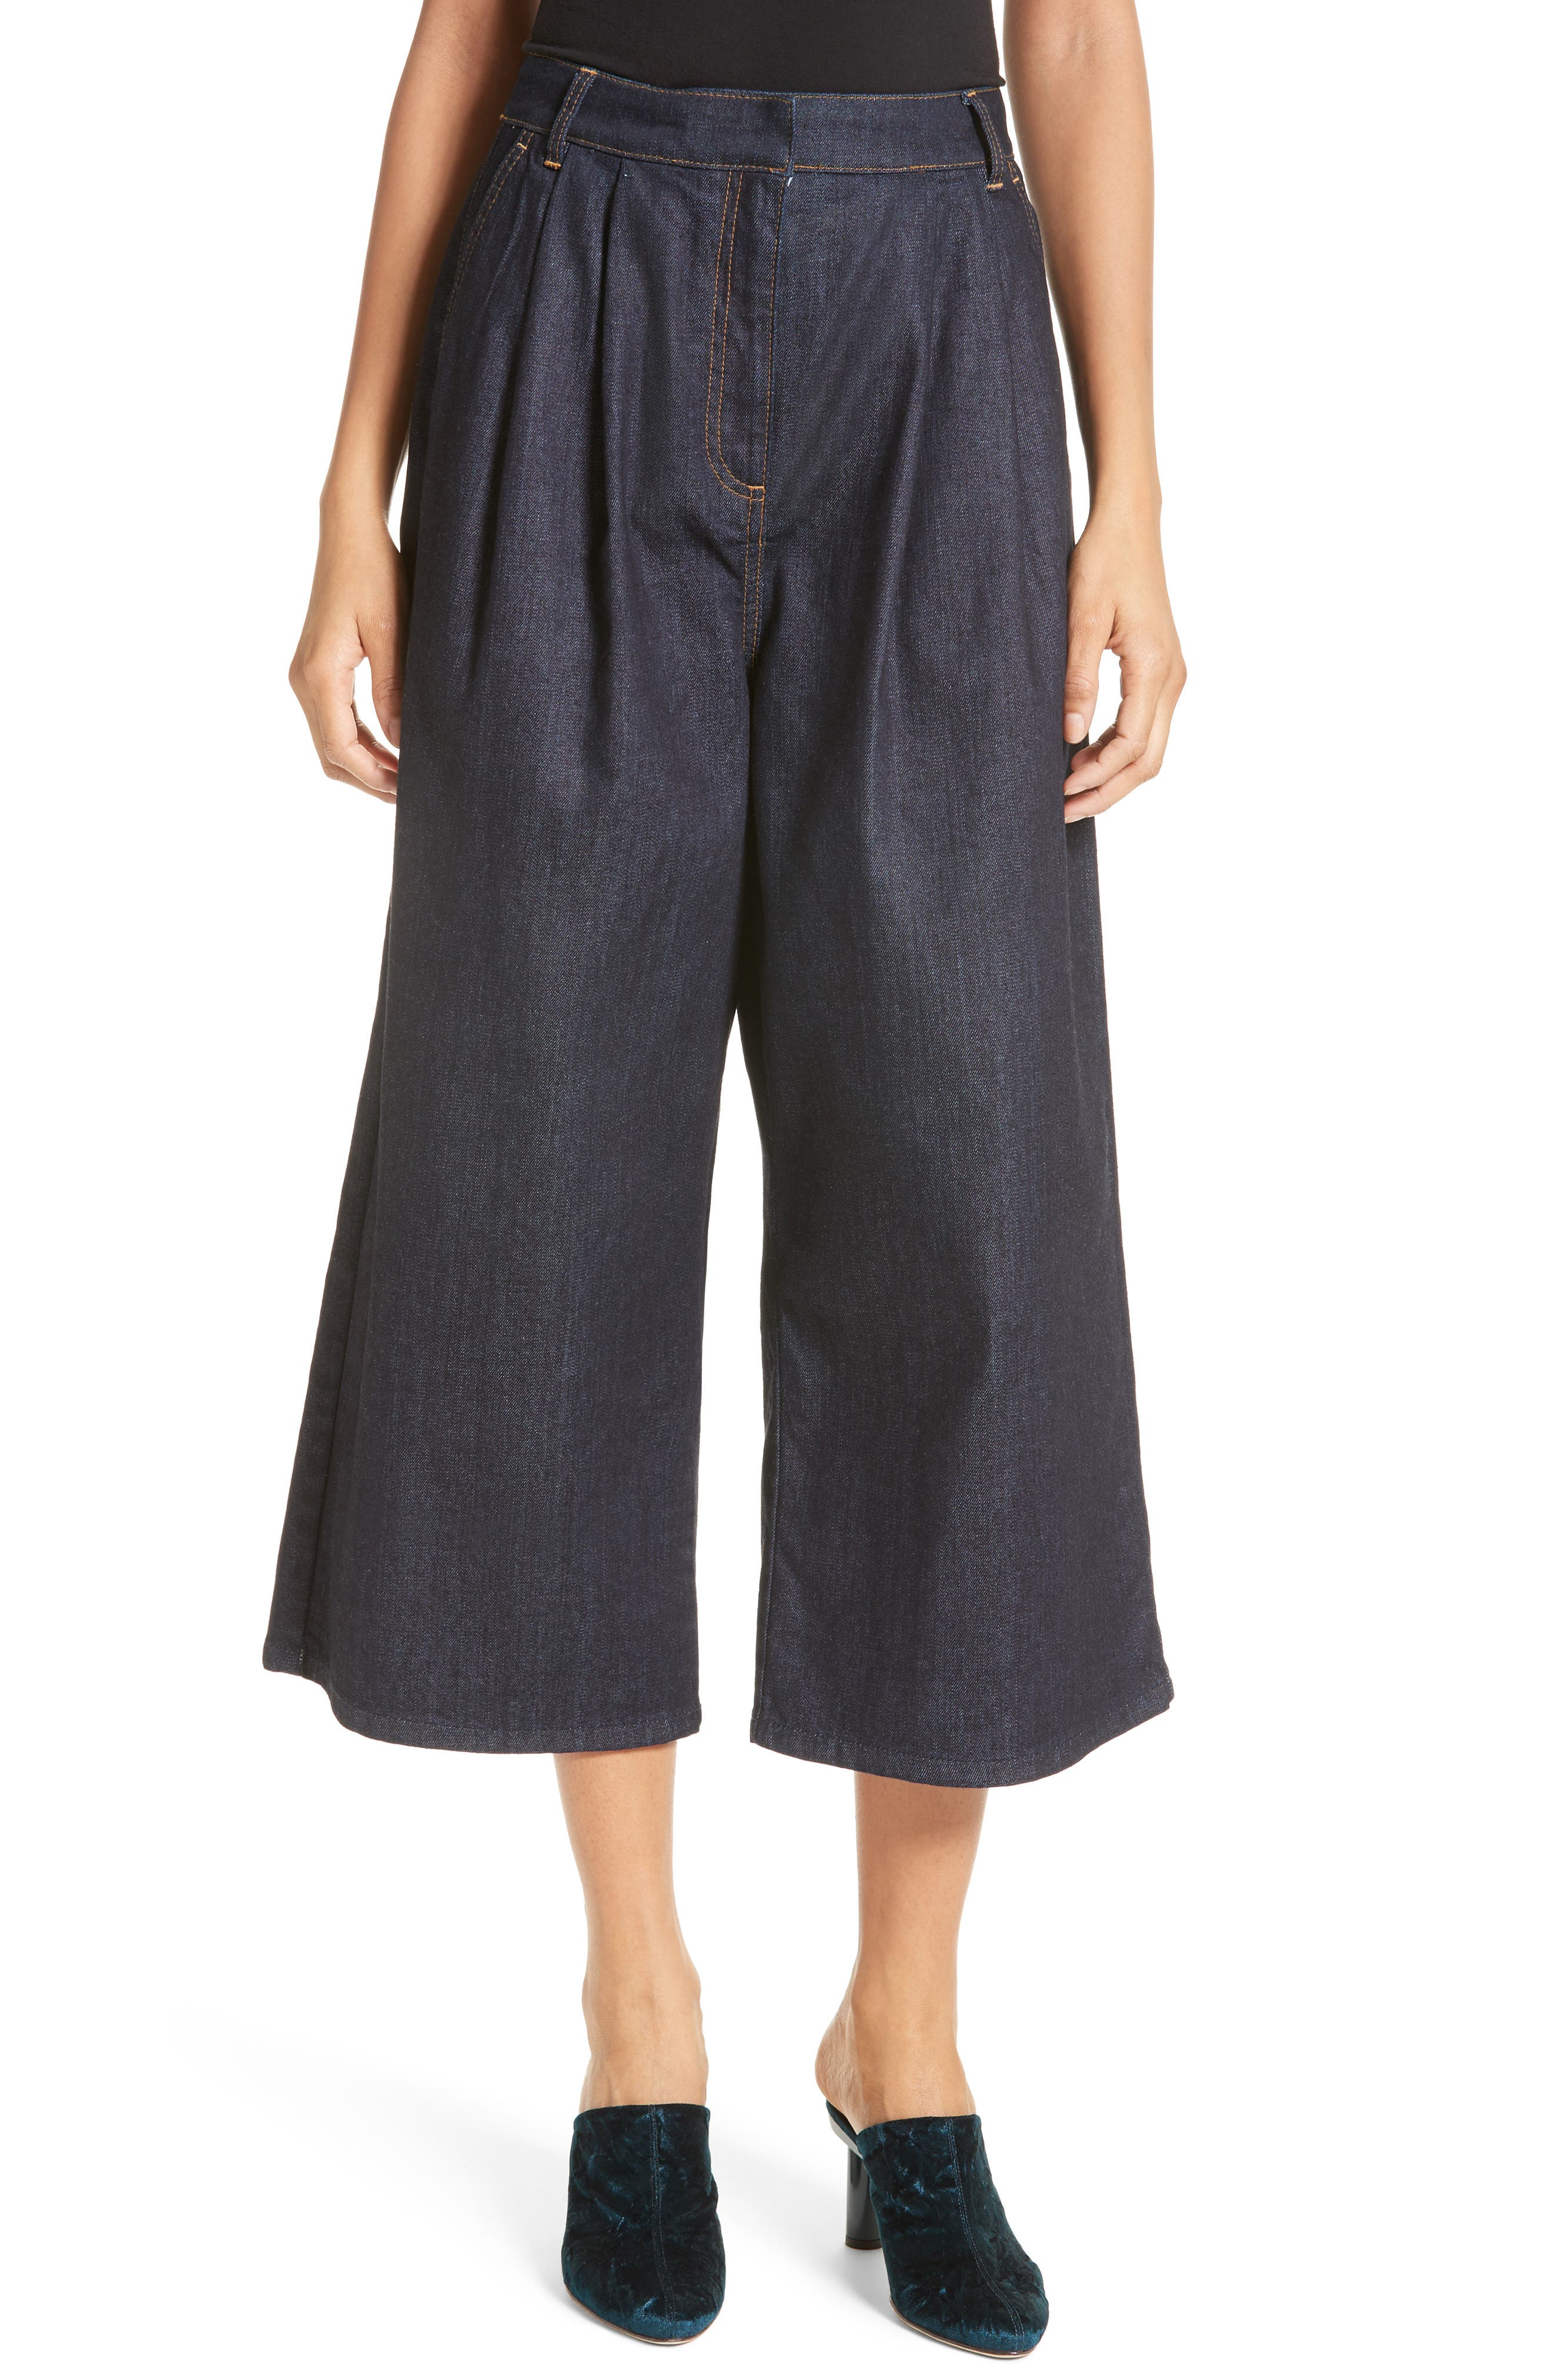 Sam High Waist Culotte Jeans,                             Main thumbnail 1, color,                             401